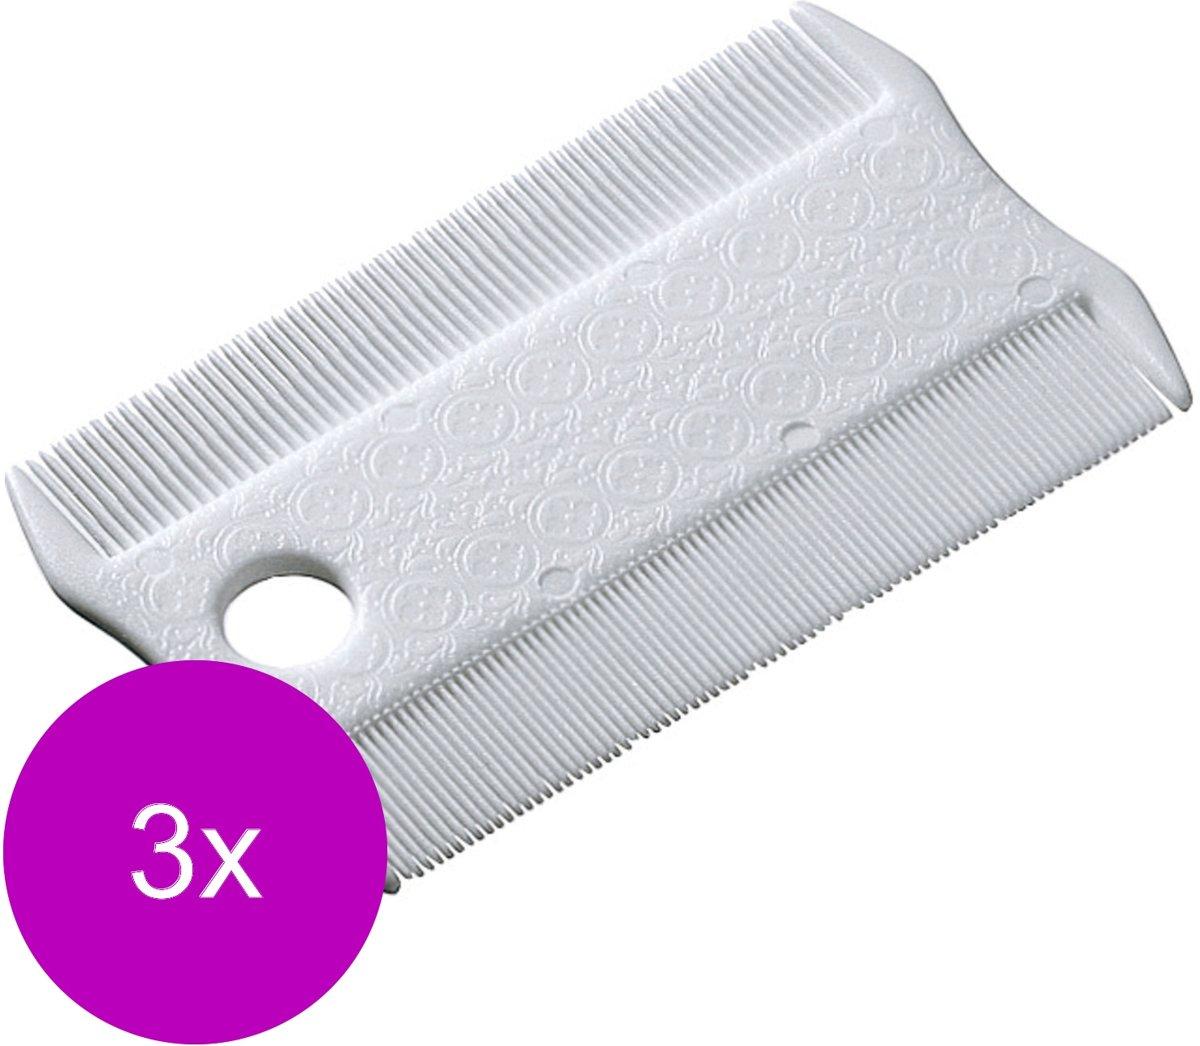 Ferplast Vlooienkam Plastic - Hondenvachtkam - 3 x 8.5x5.2x0.3 cm Wit kopen